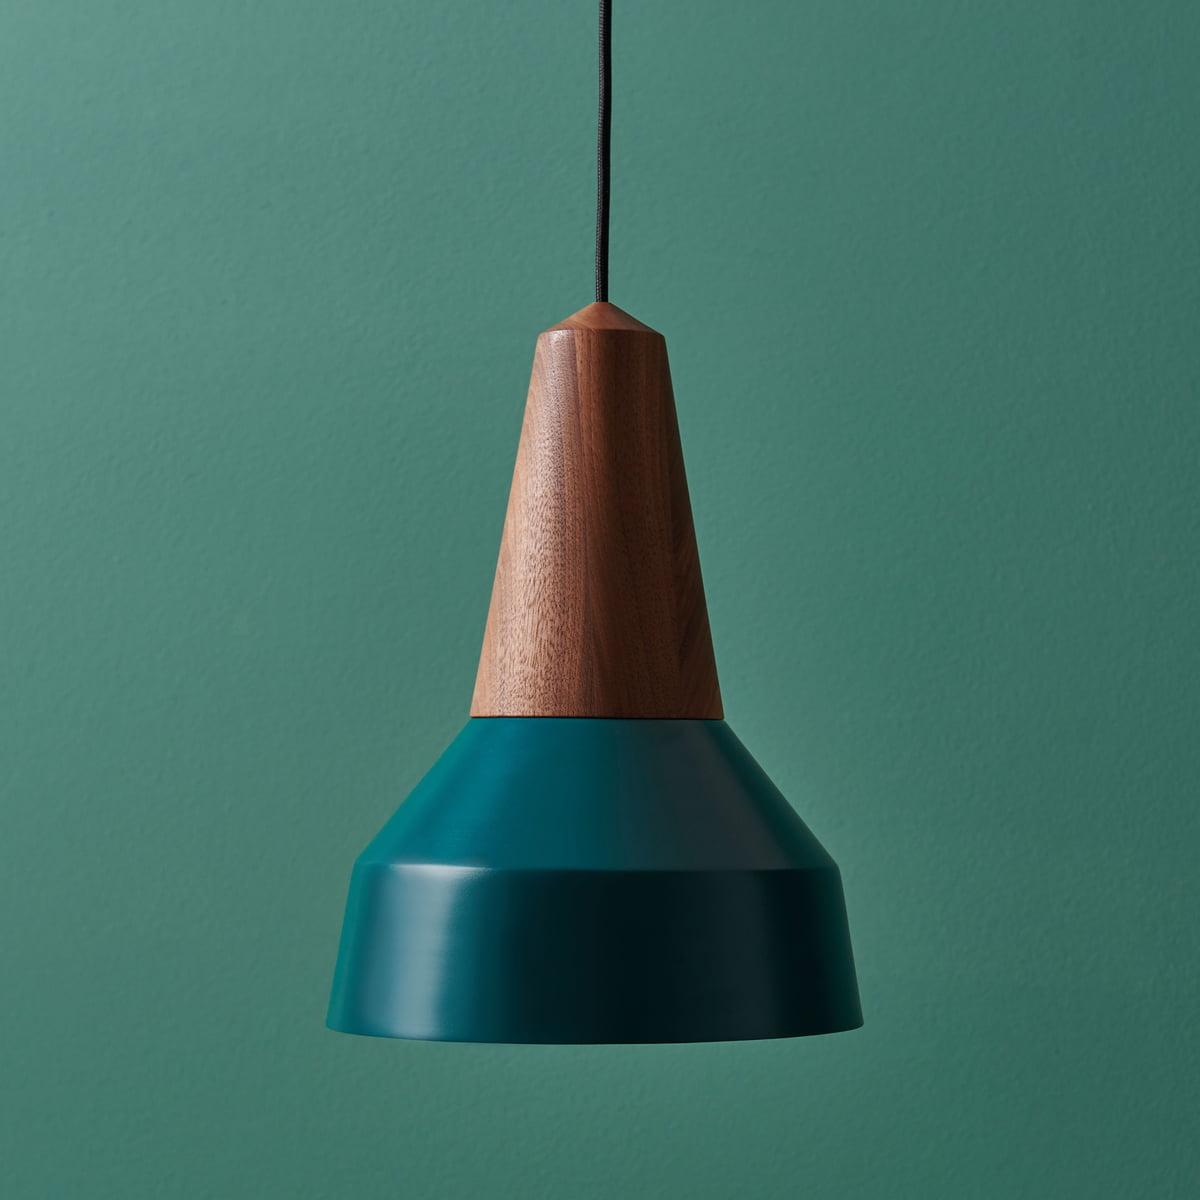 Eikon basic pendant lamp by schneid online the schneid eikon basic pendant lamp in walnut green aloadofball Choice Image